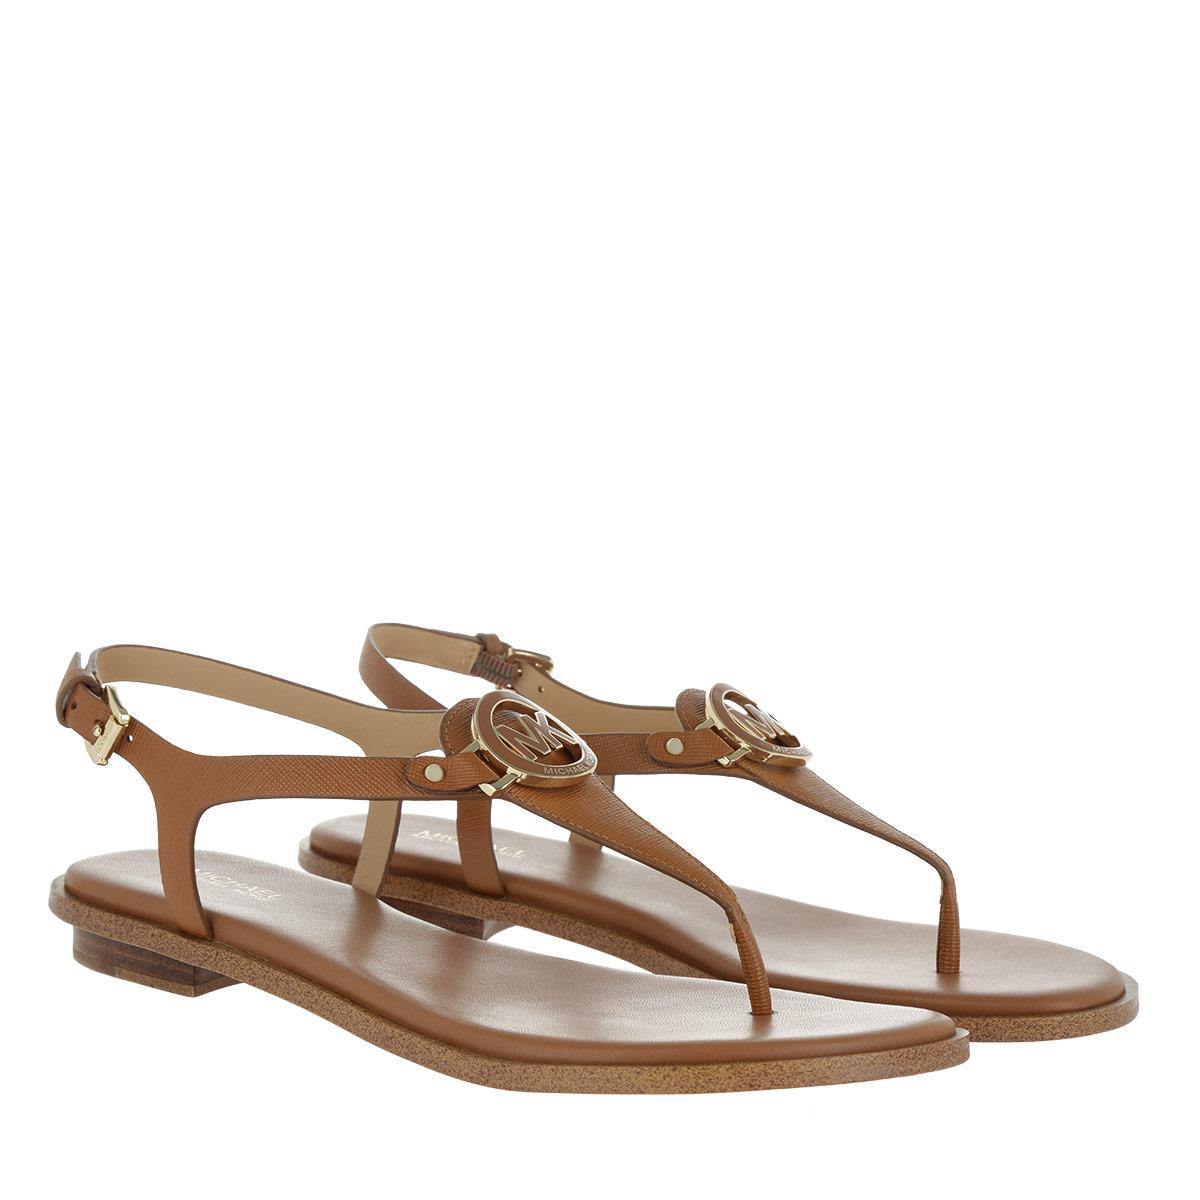 6fa4d021d Michael Kors Lee Thong Leather Sandal Acorn in Brown - Lyst